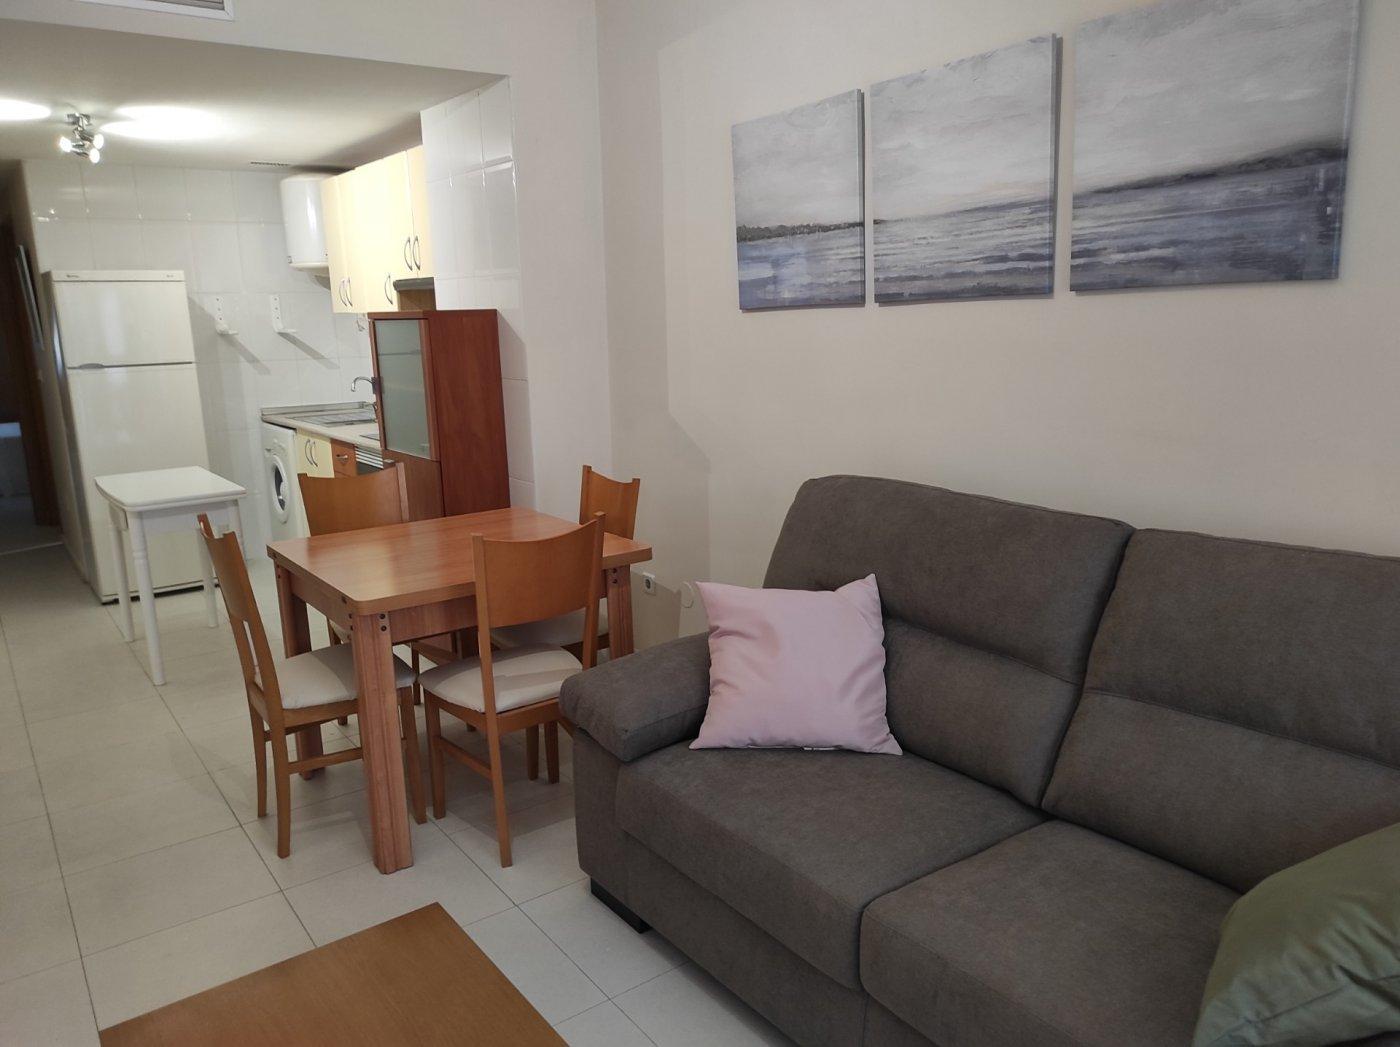 Piso ref 3425 para rent en Barrio Del Carmen España - Quality Homes Costa Cálida